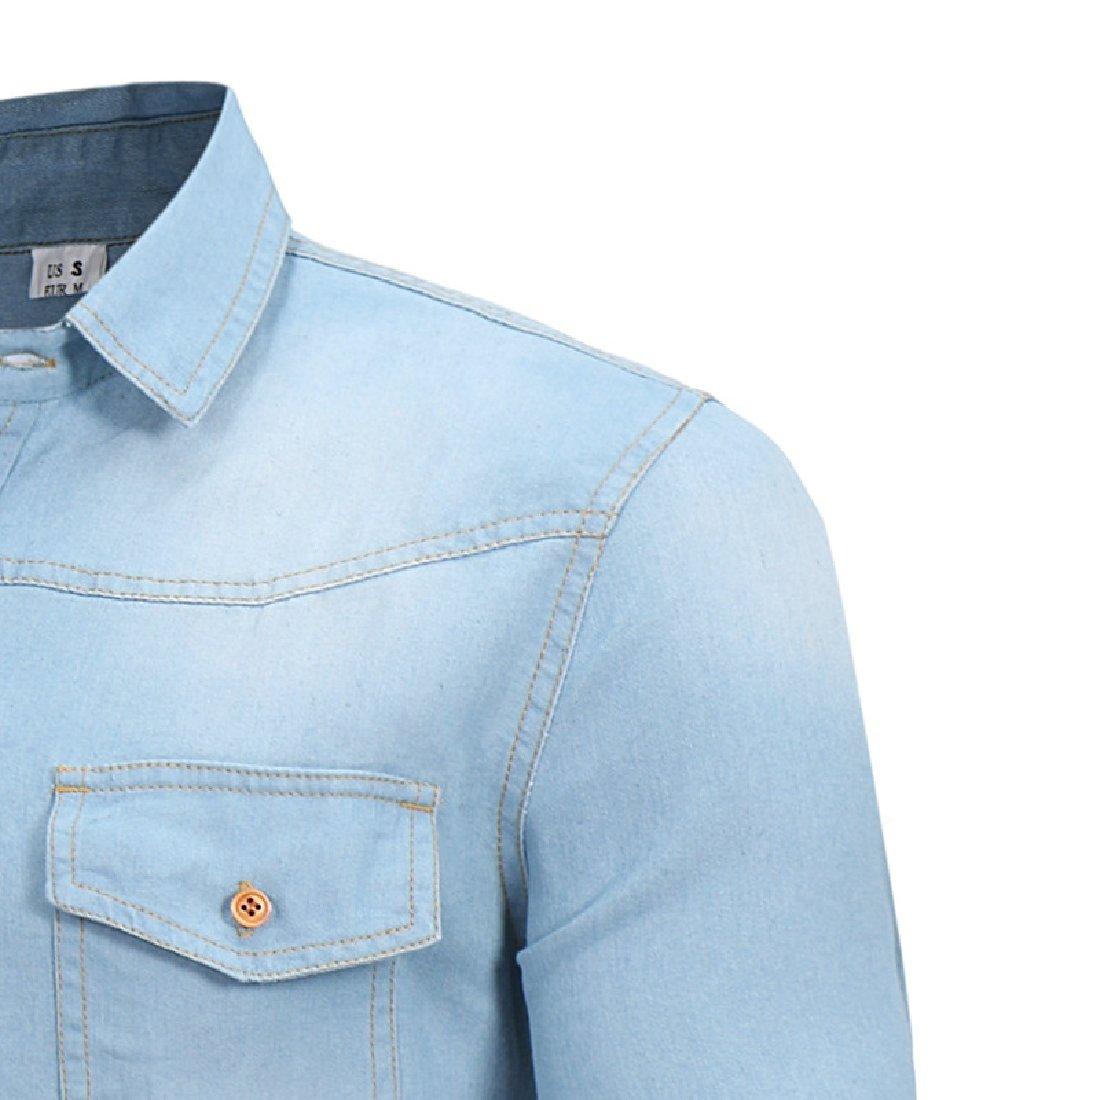 Vska Mens Casual Denim Shirt Long Sleeve Button Down Shirt British Style